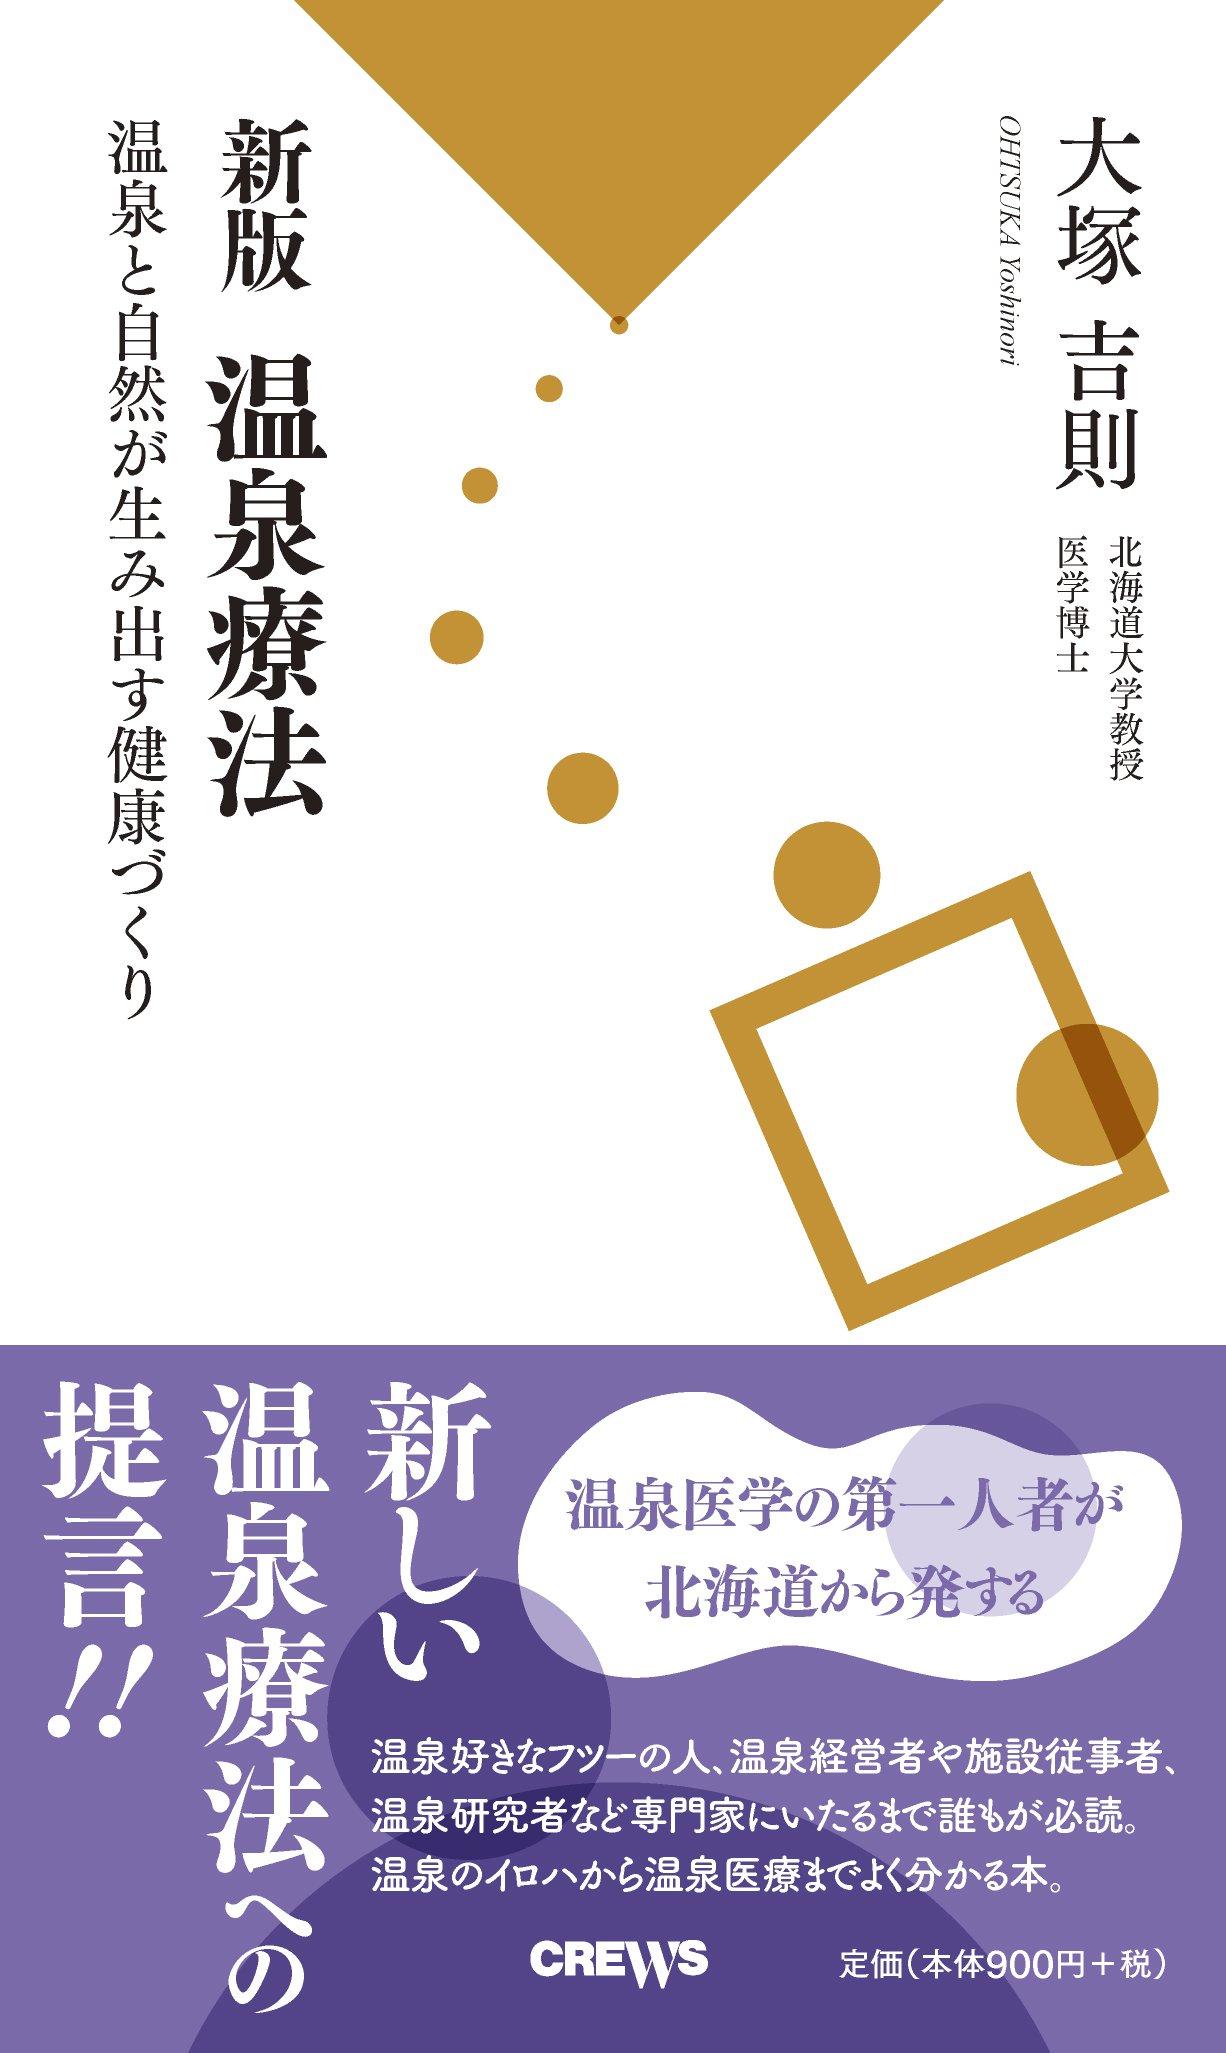 Amazon.co.jp: 新版 温泉療法: 大塚 吉則, 本多 政史: 本